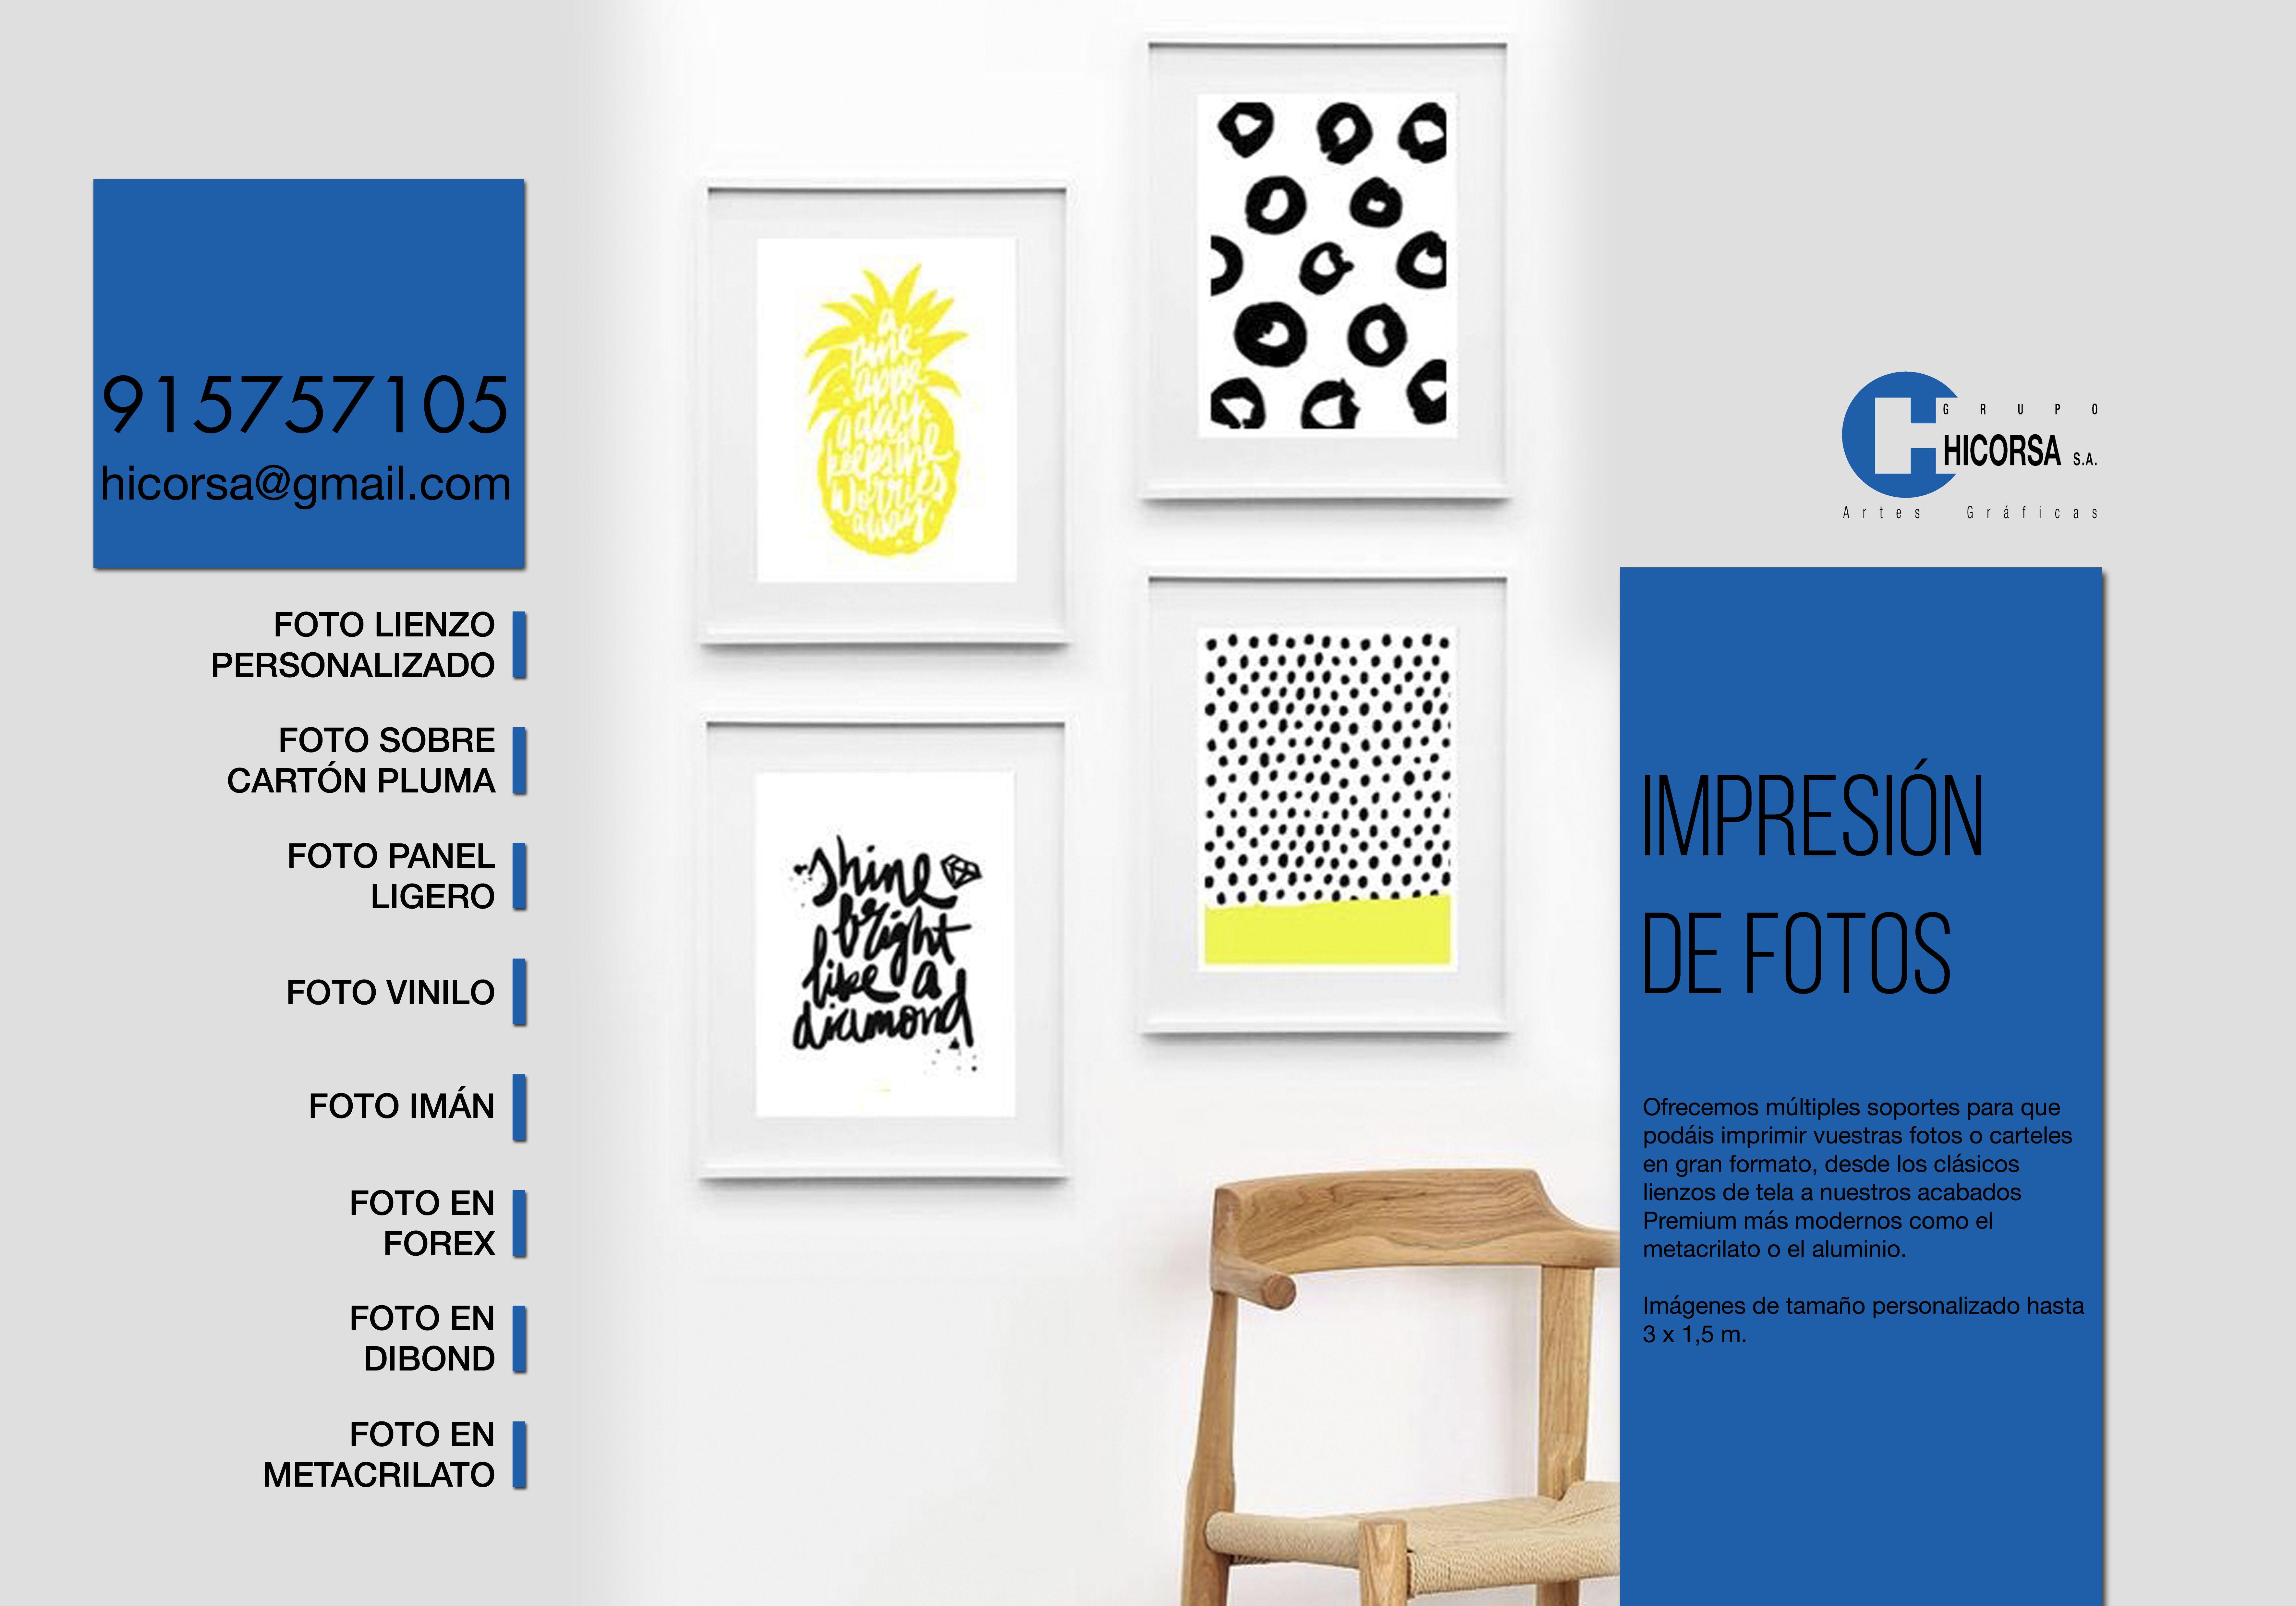 Foto 4 de Artes gráficas en Madrid | Grupo Hicorsa